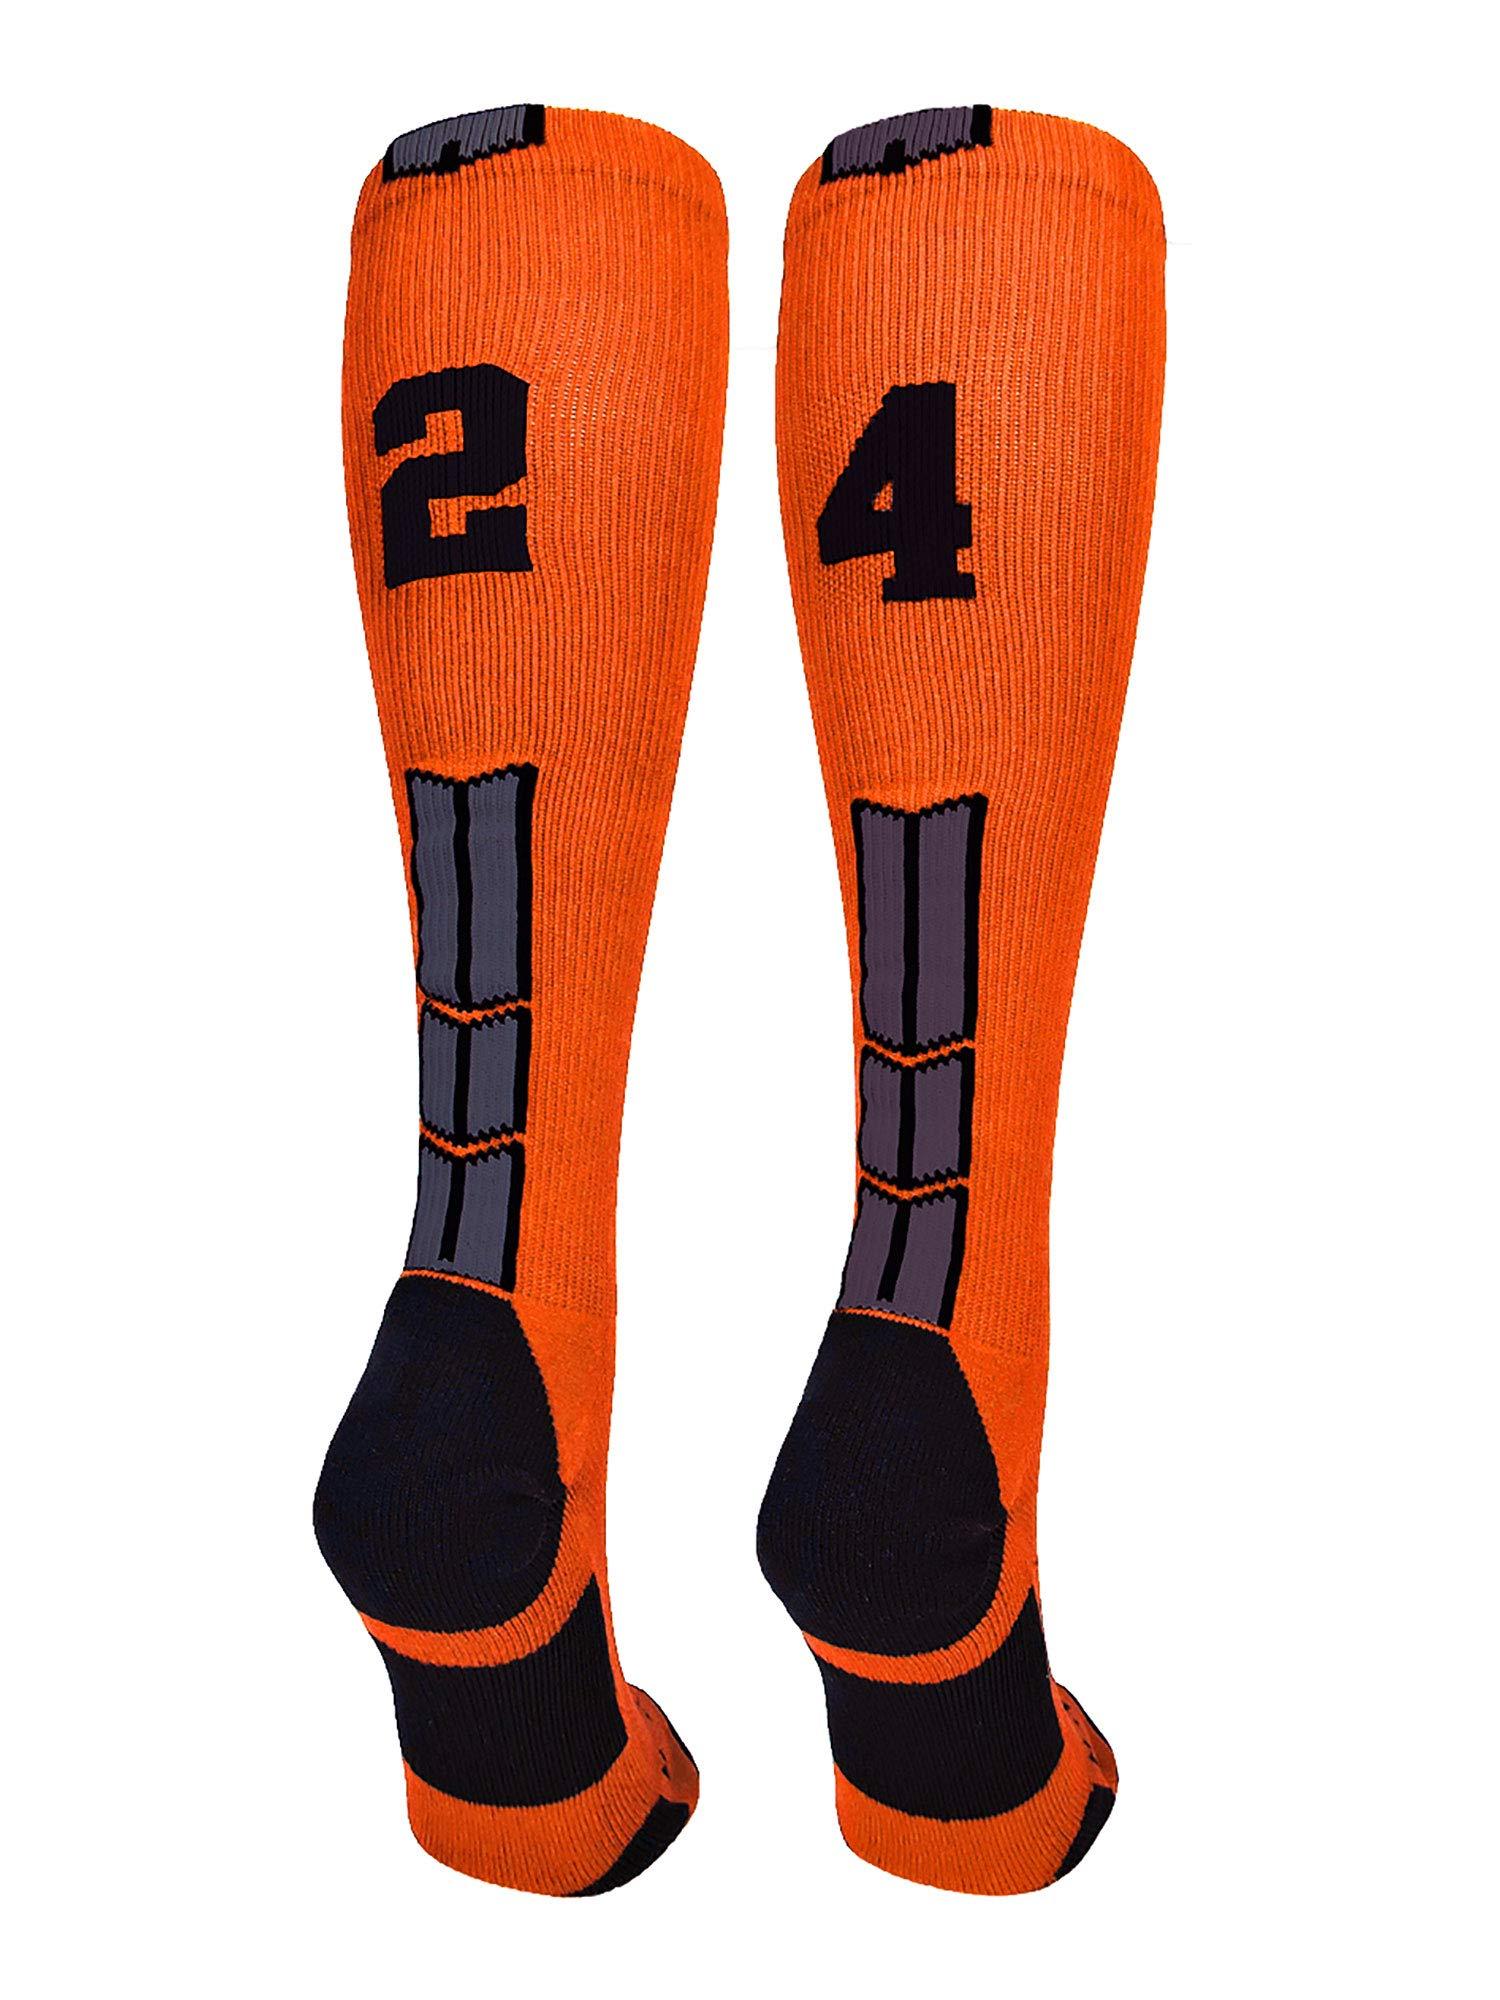 MadSportsStuff Orange/Black Player Id Over the Calf Number Socks (#24, Medium) by MadSportsStuff (Image #1)